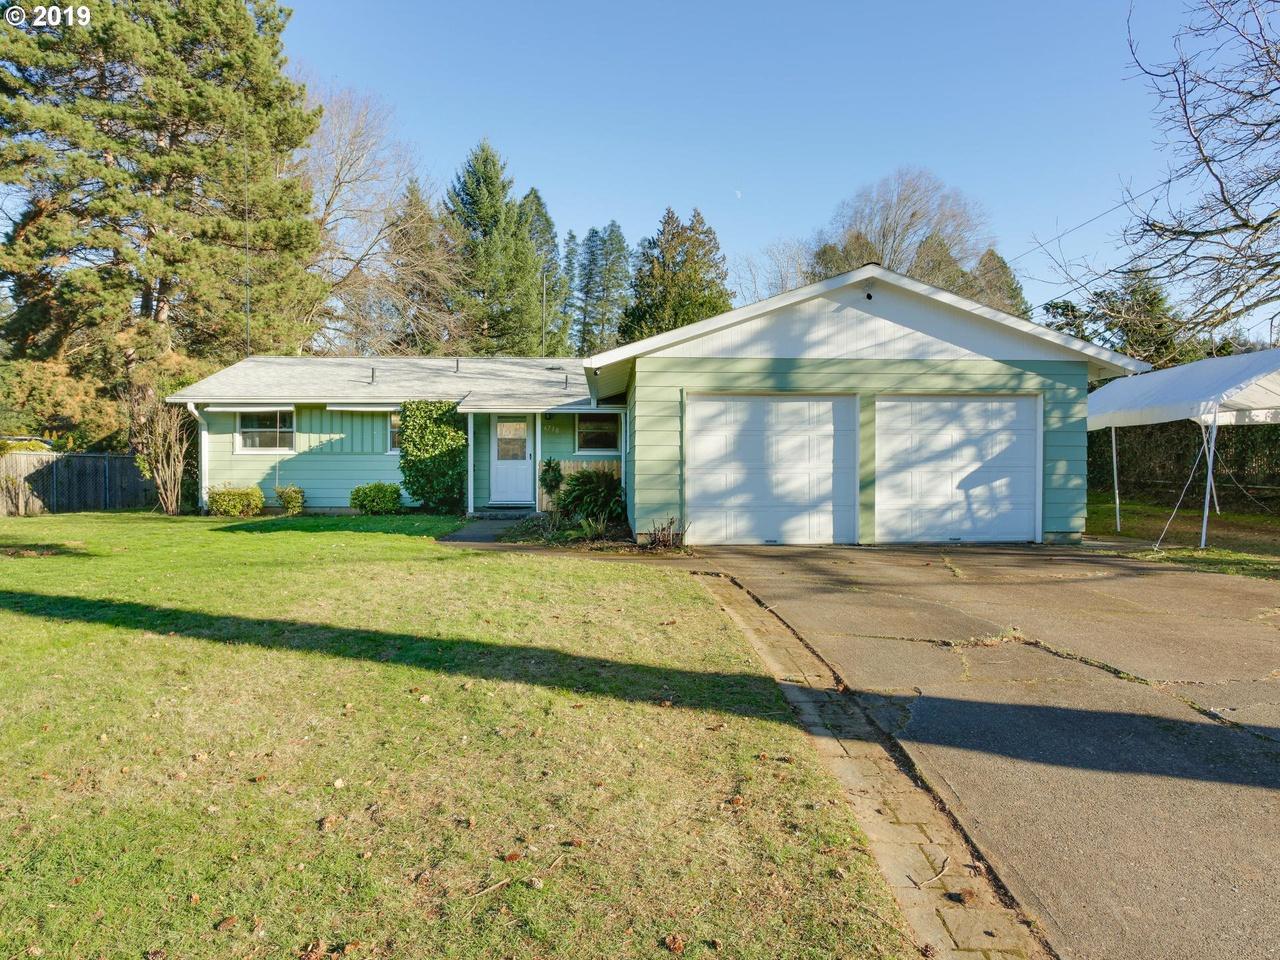 6730 SE 131st Pl, Portland, OR 97236 - 3 beds/1 bath